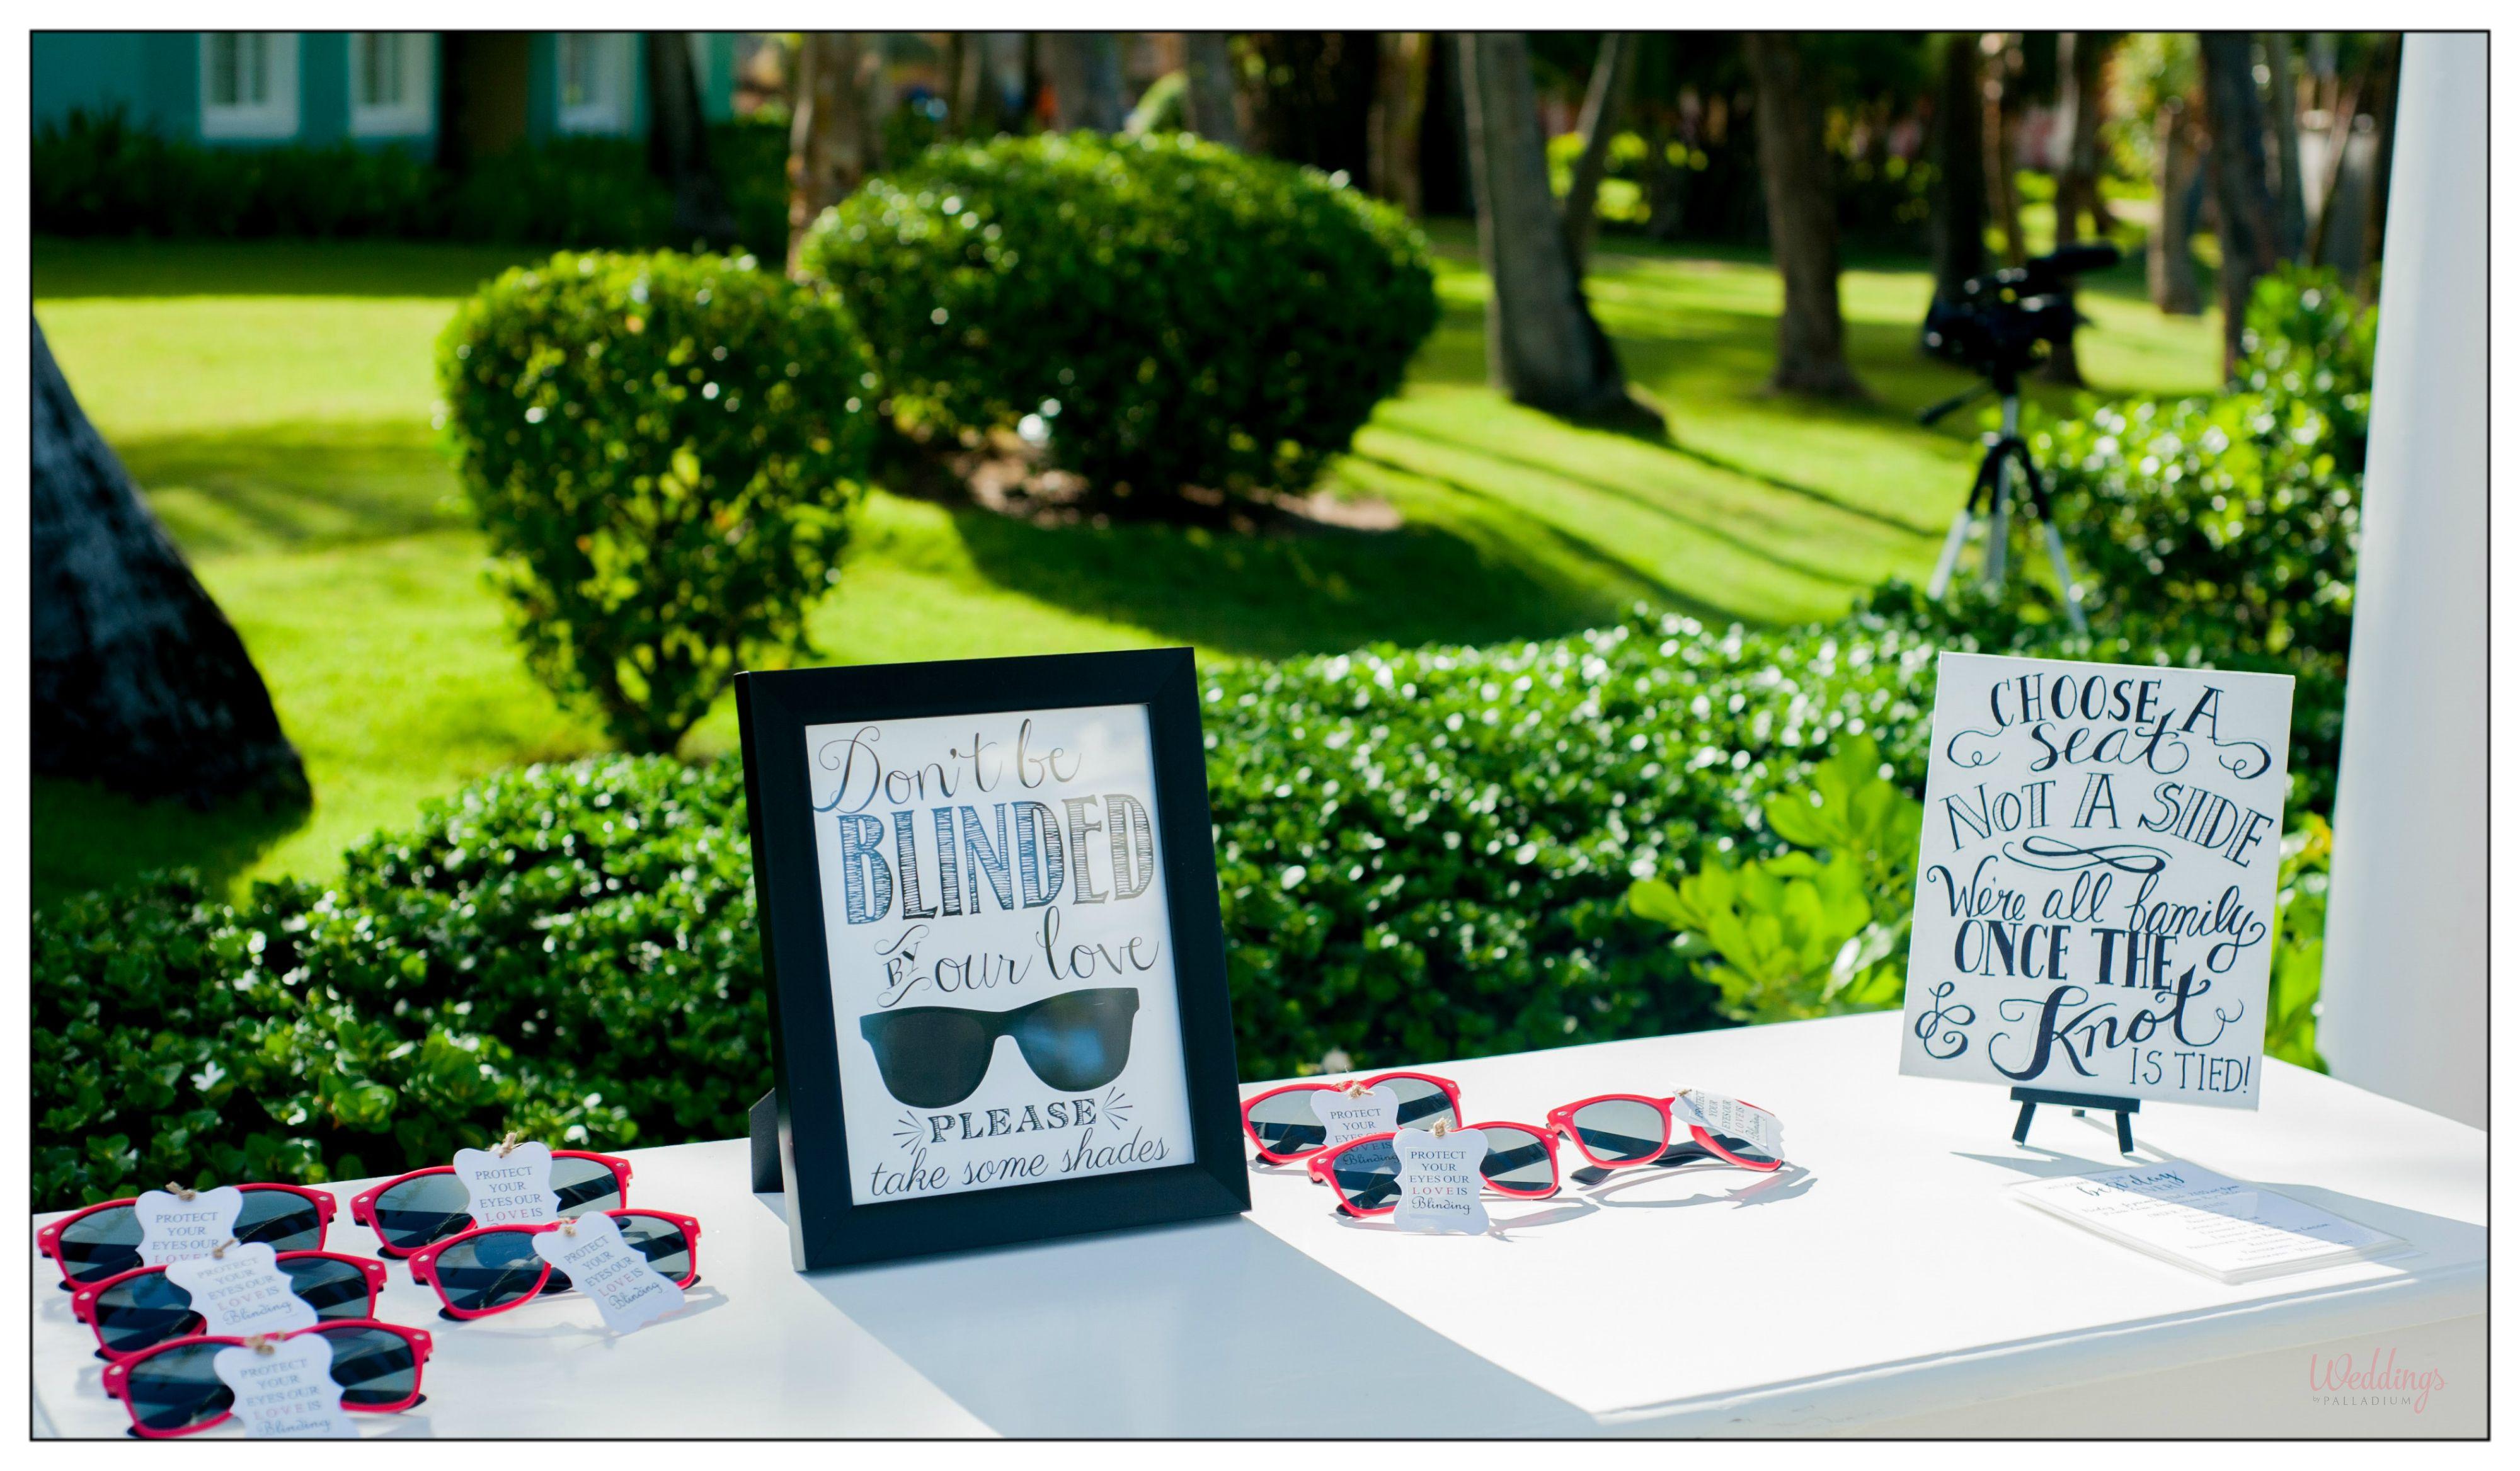 Don't get blinded by our #love/No se queden cegados con nuestro #amor, #boda, Punta Cana